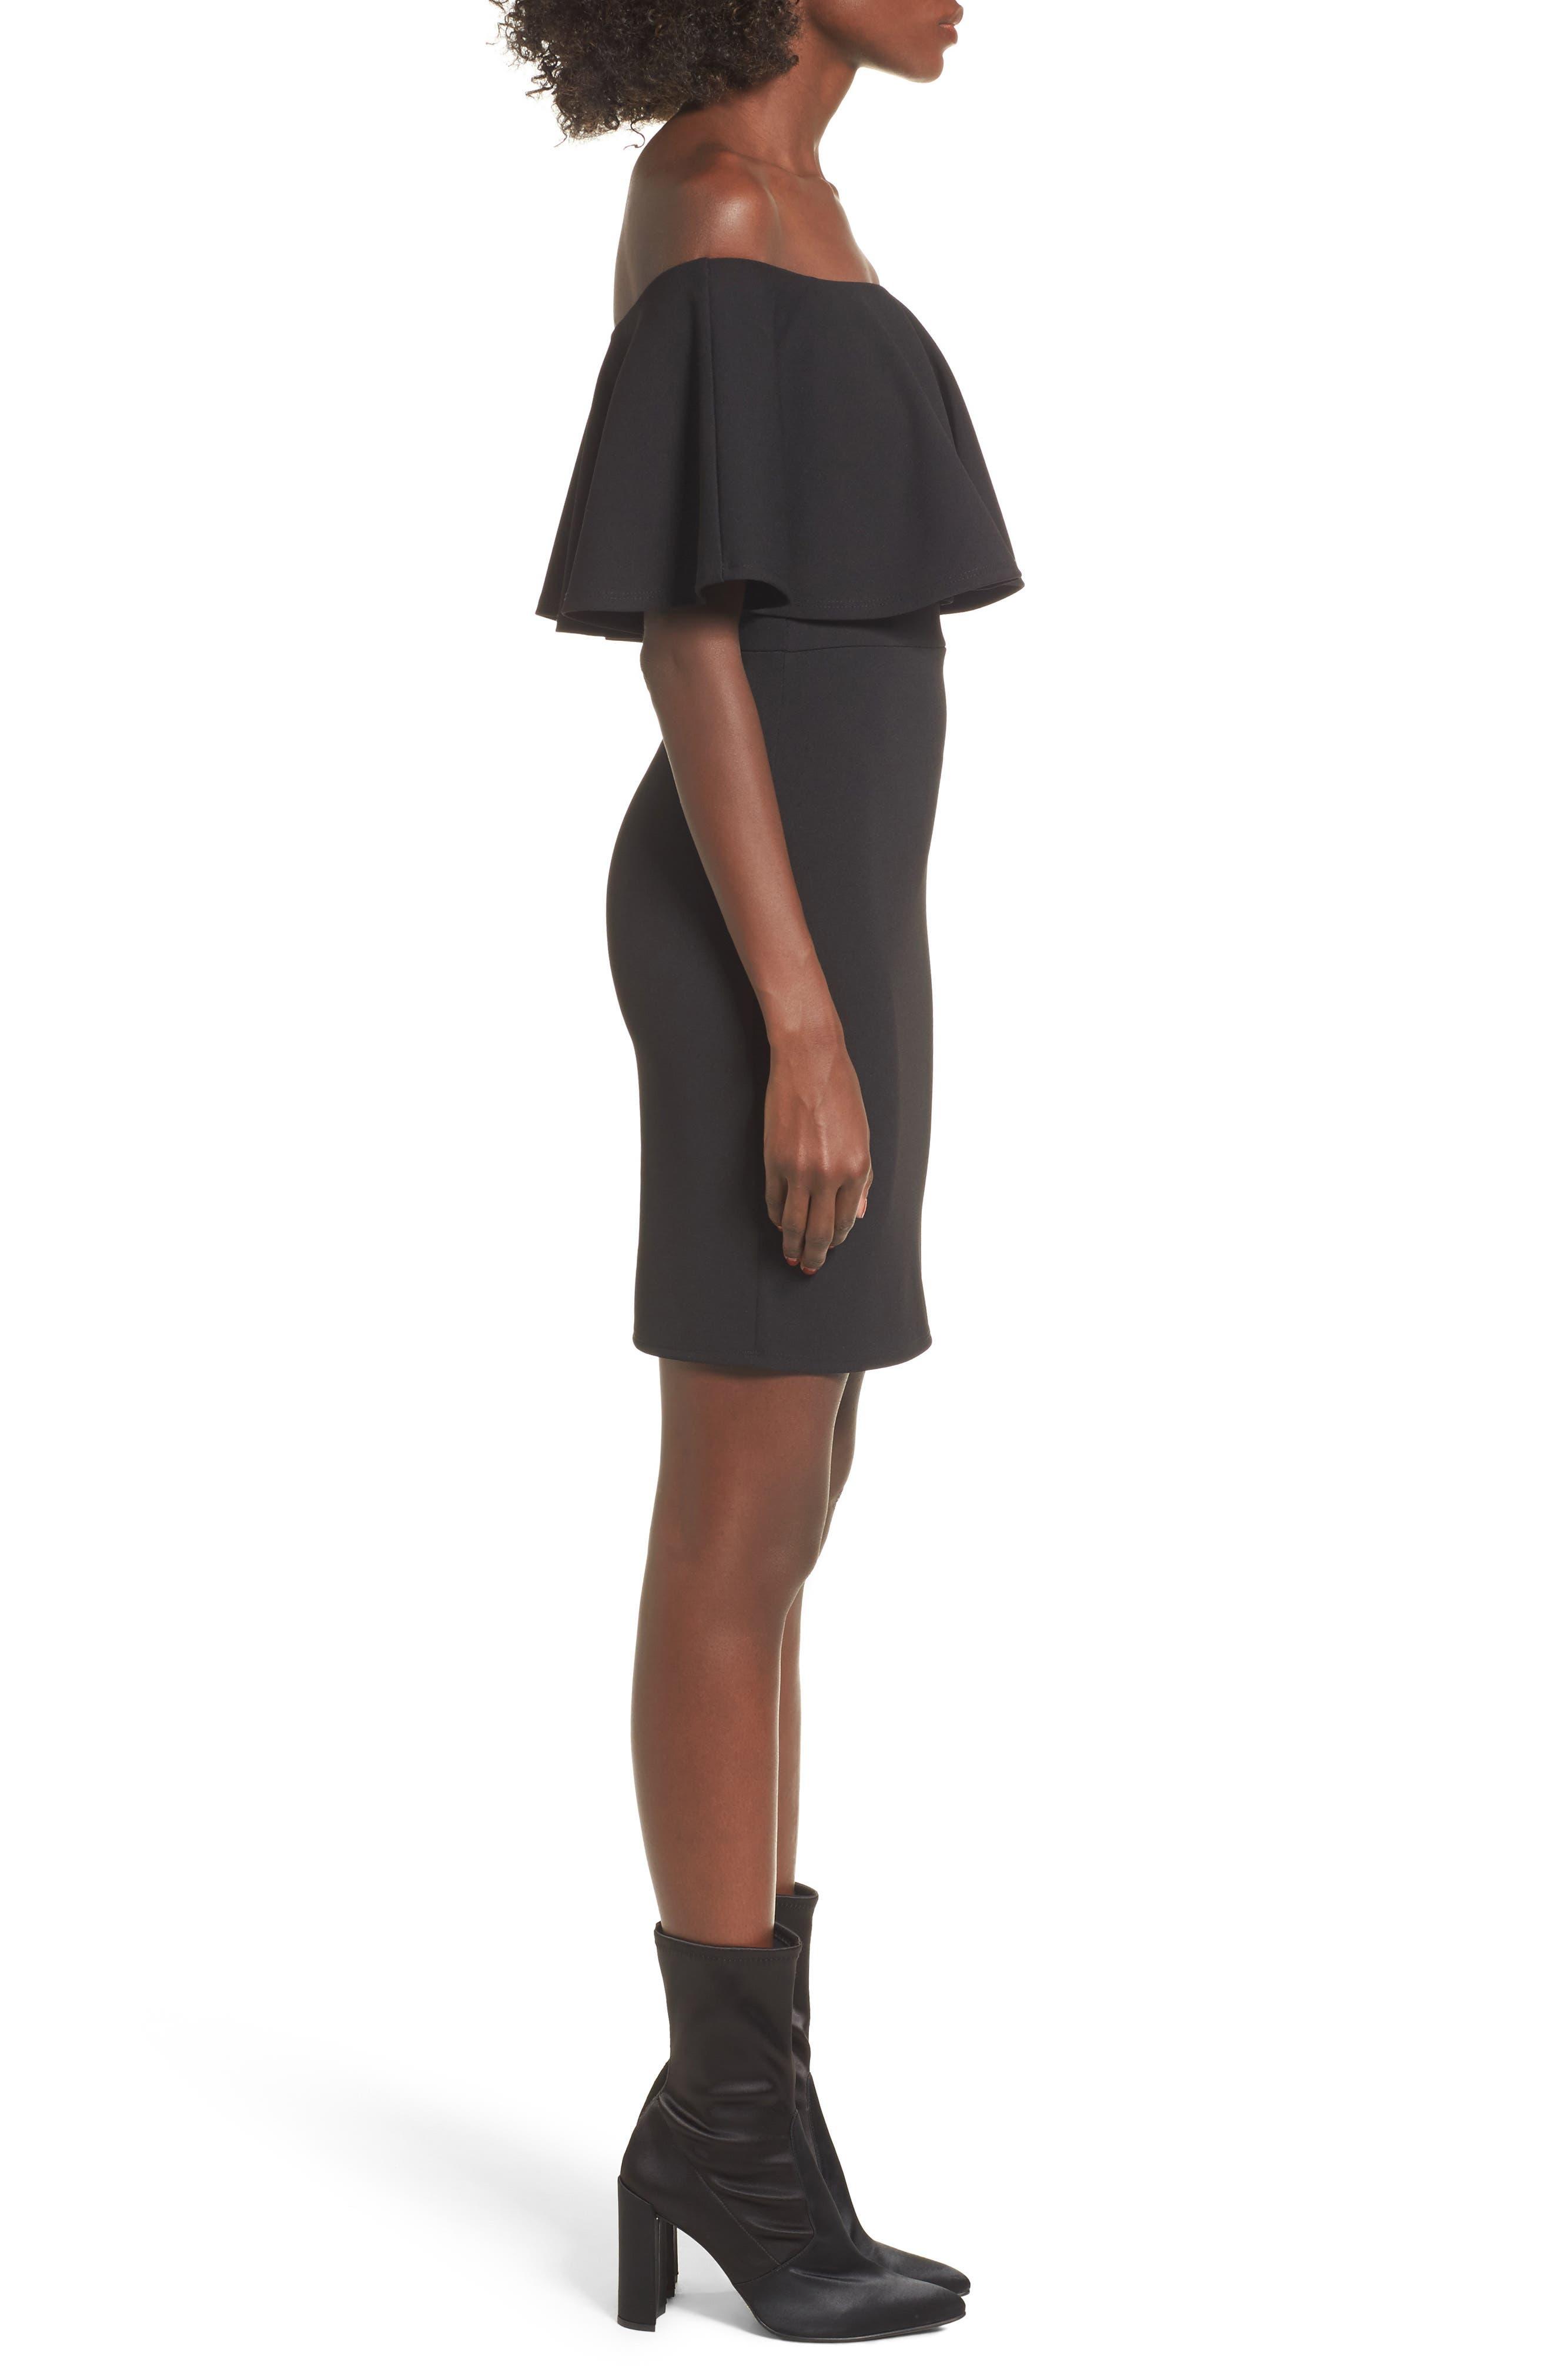 SOPRANO, Ruffle Off the Shoulder Body-Con Dress, Alternate thumbnail 4, color, 001